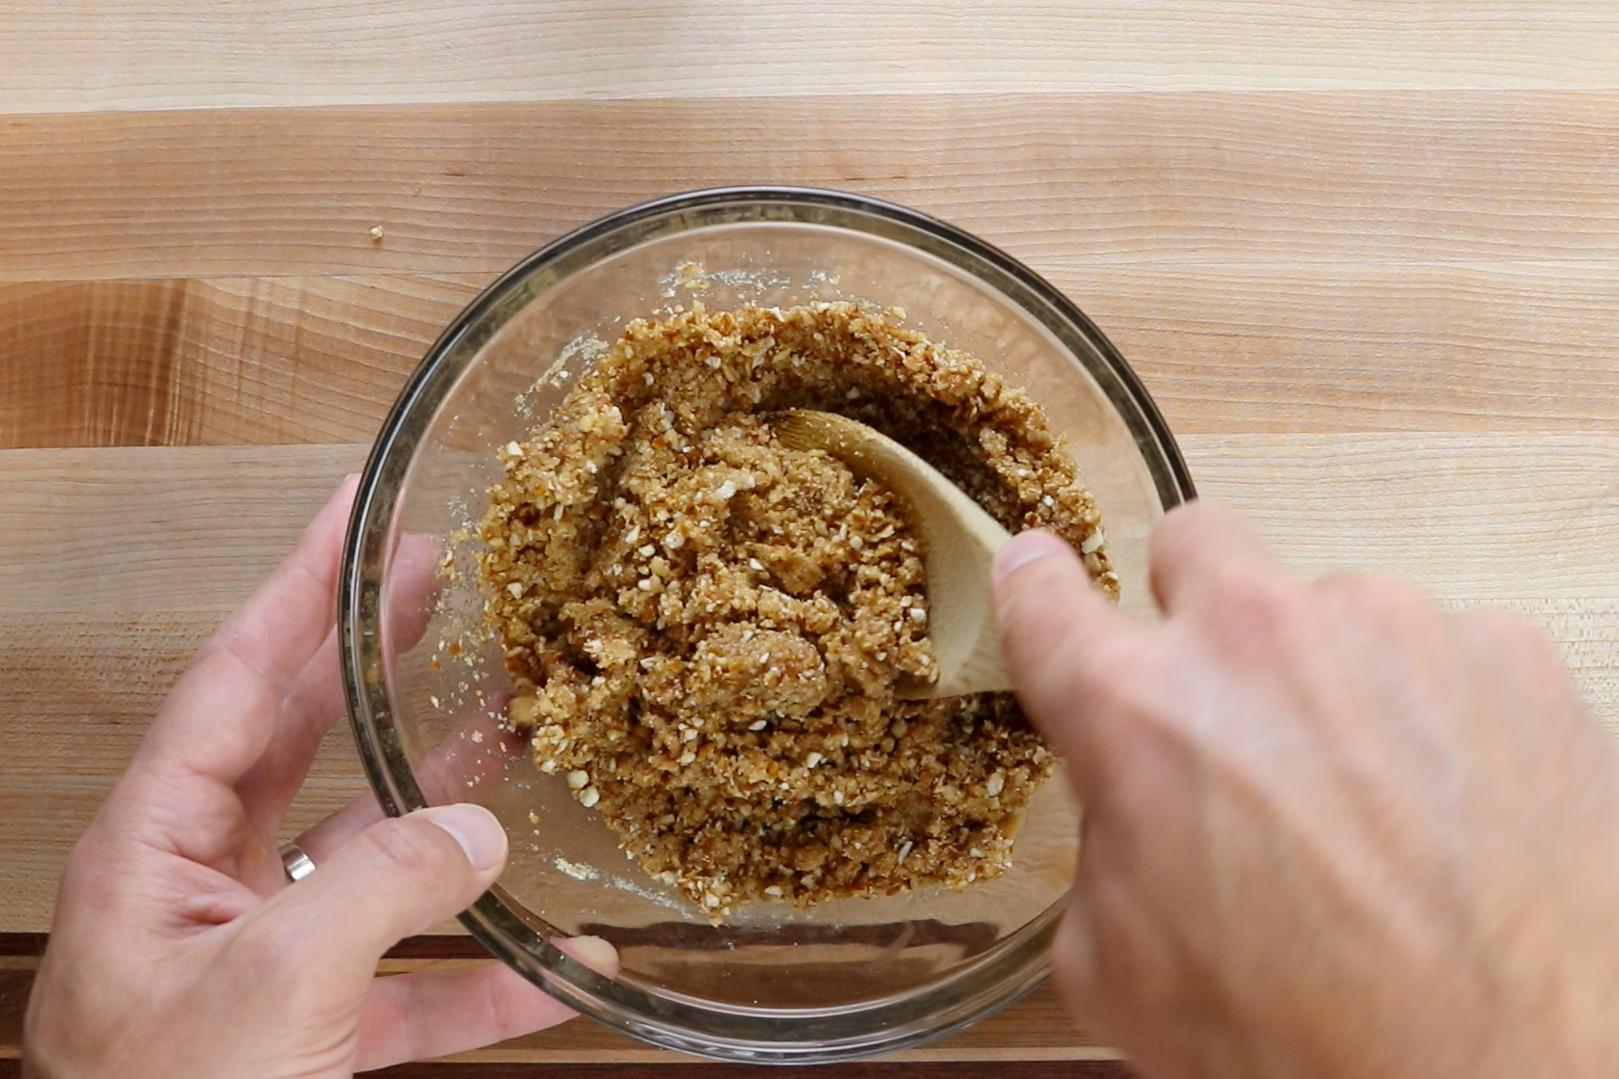 4.Add pretzel/graham cracker mixture and stir until combined. -